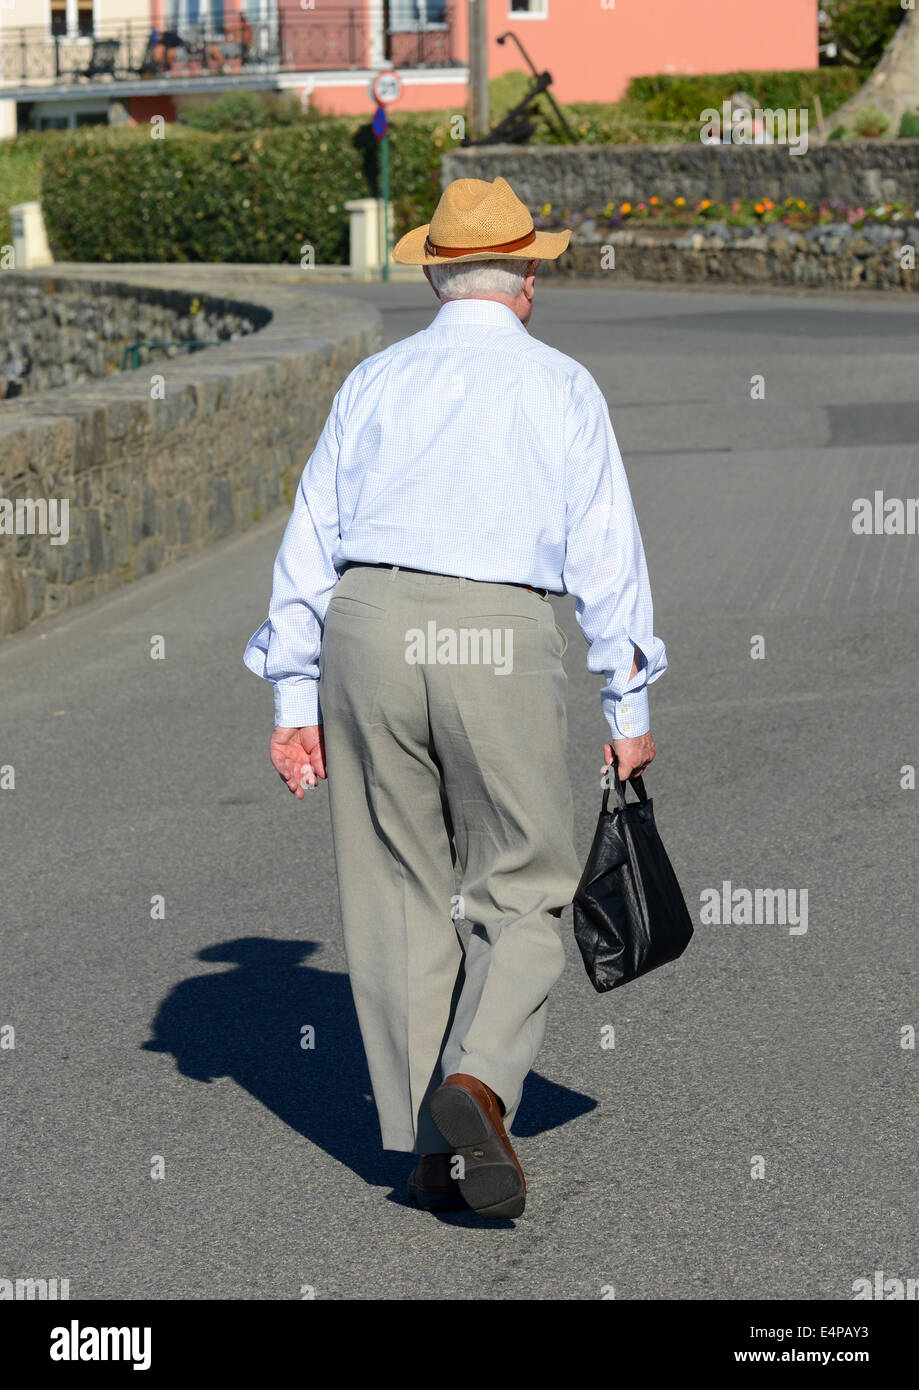 An old man carrying his wifes handbag - Stock Image